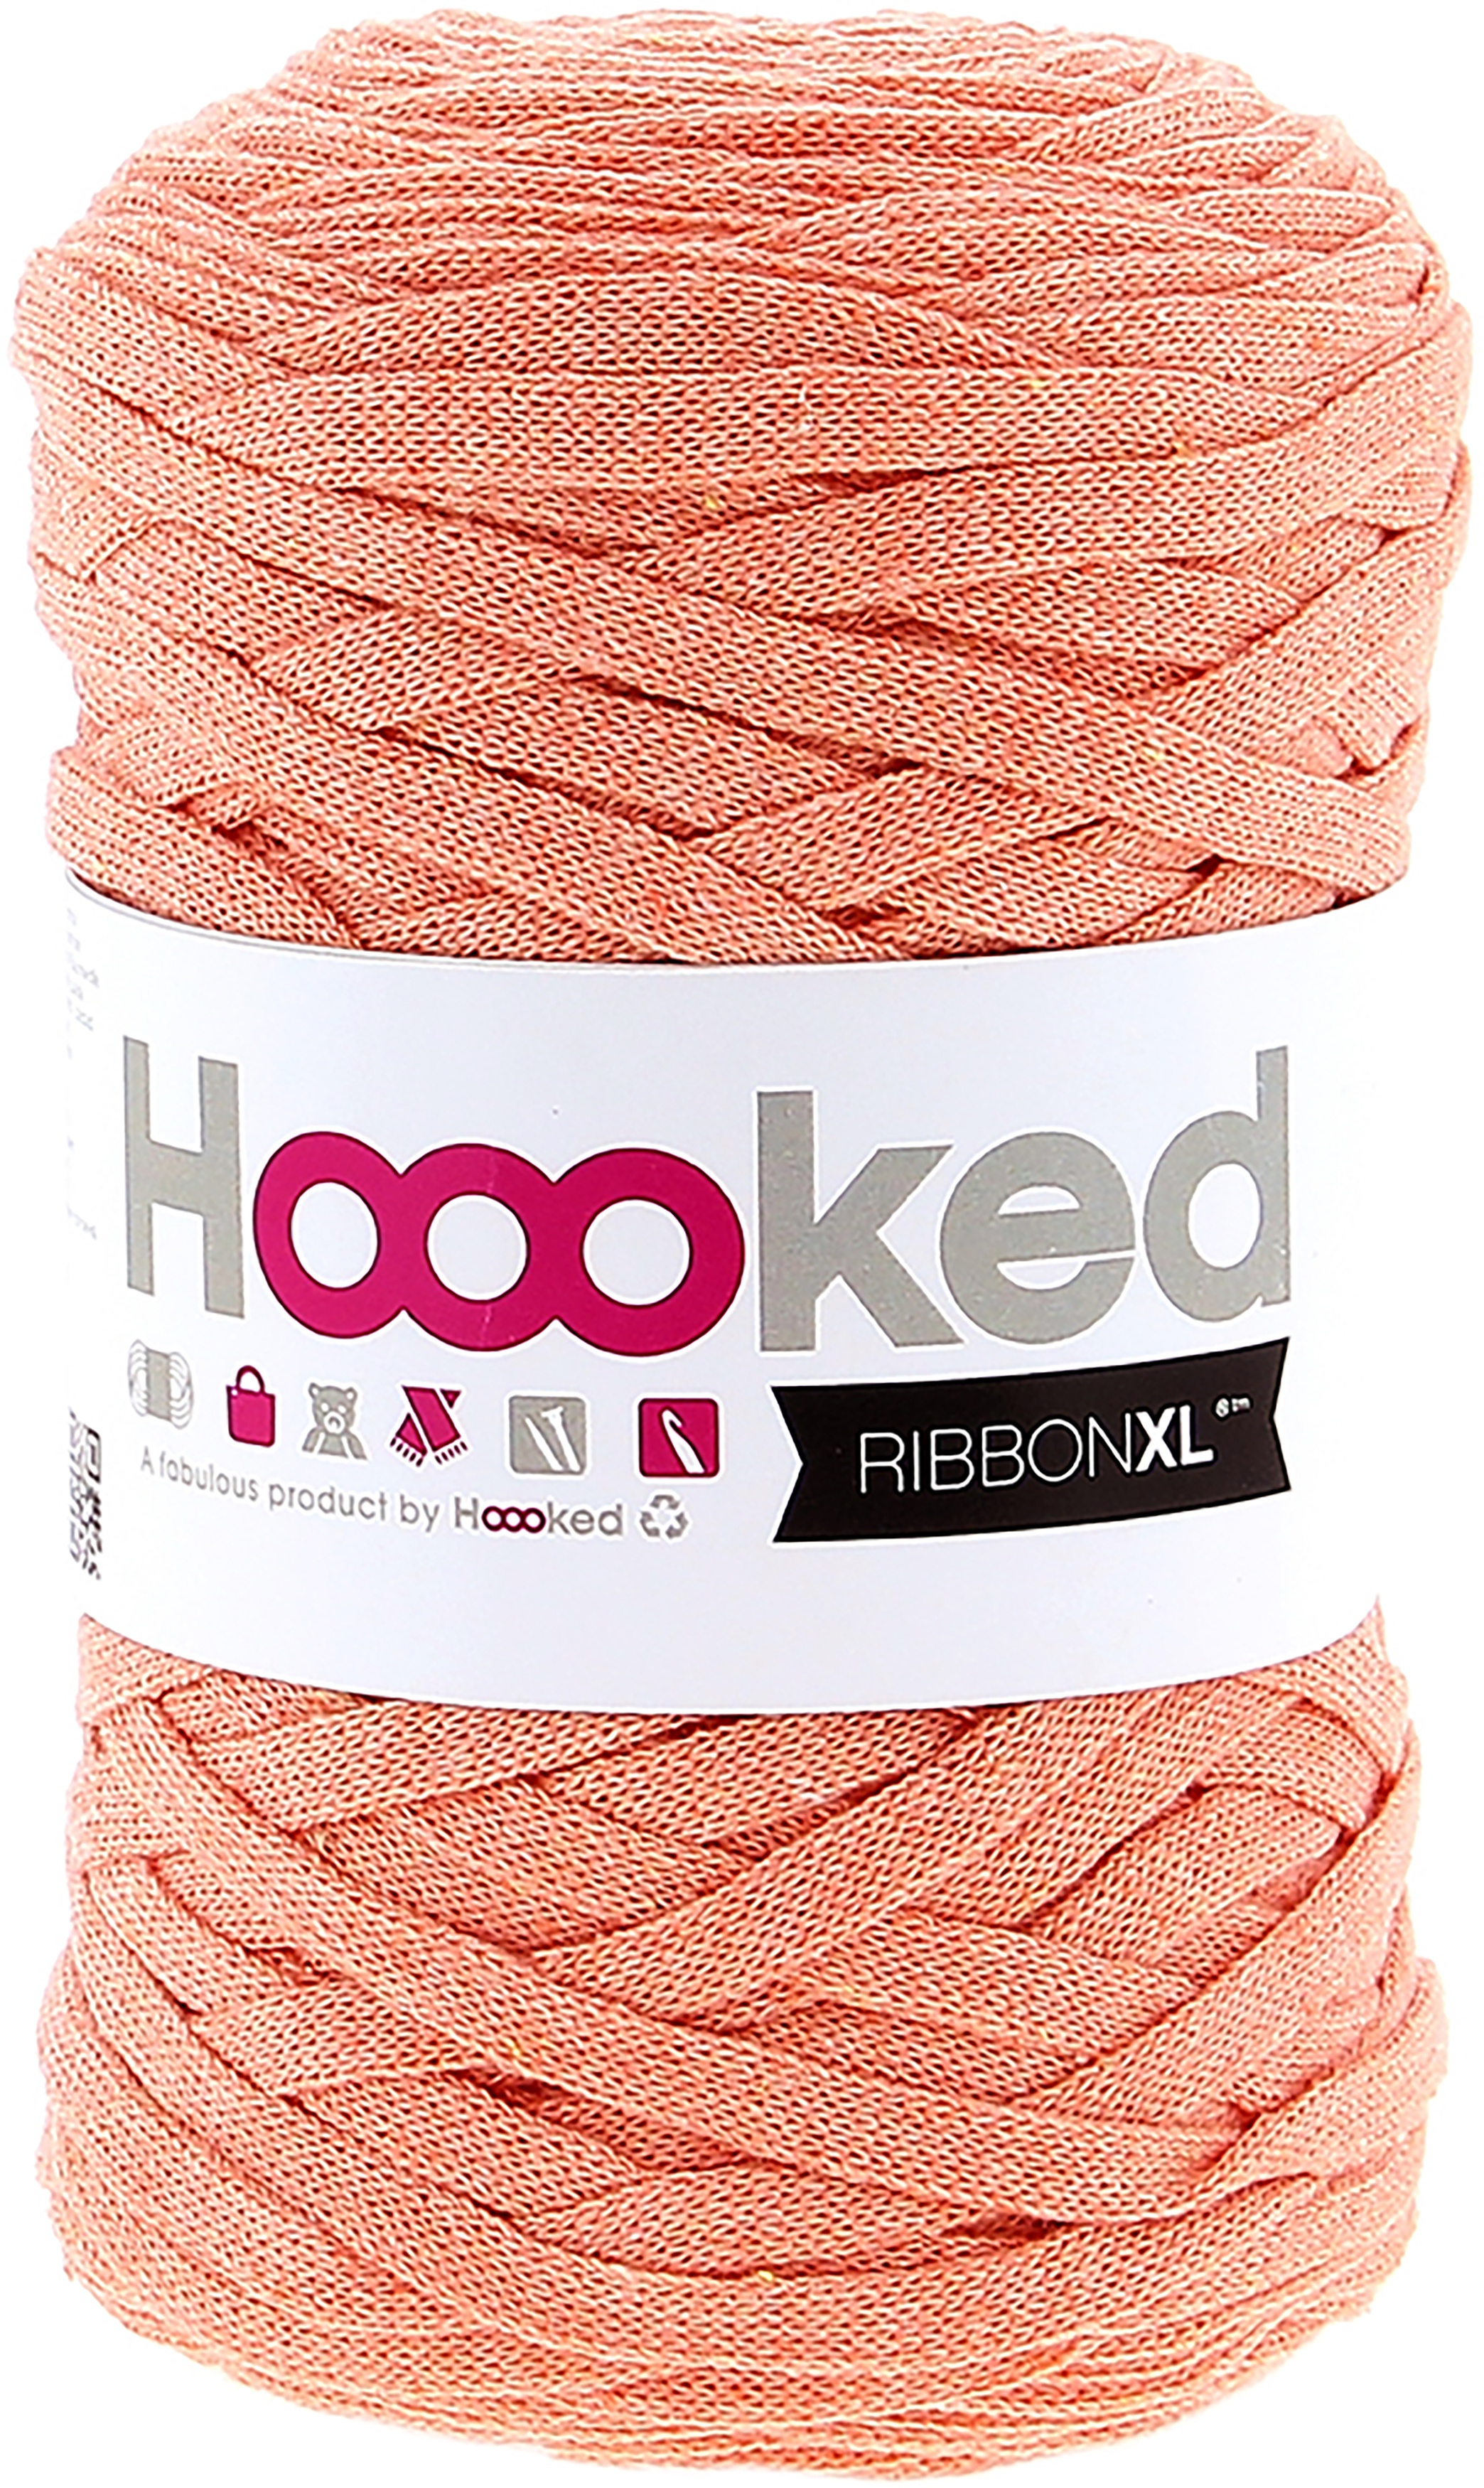 Ribbon XL